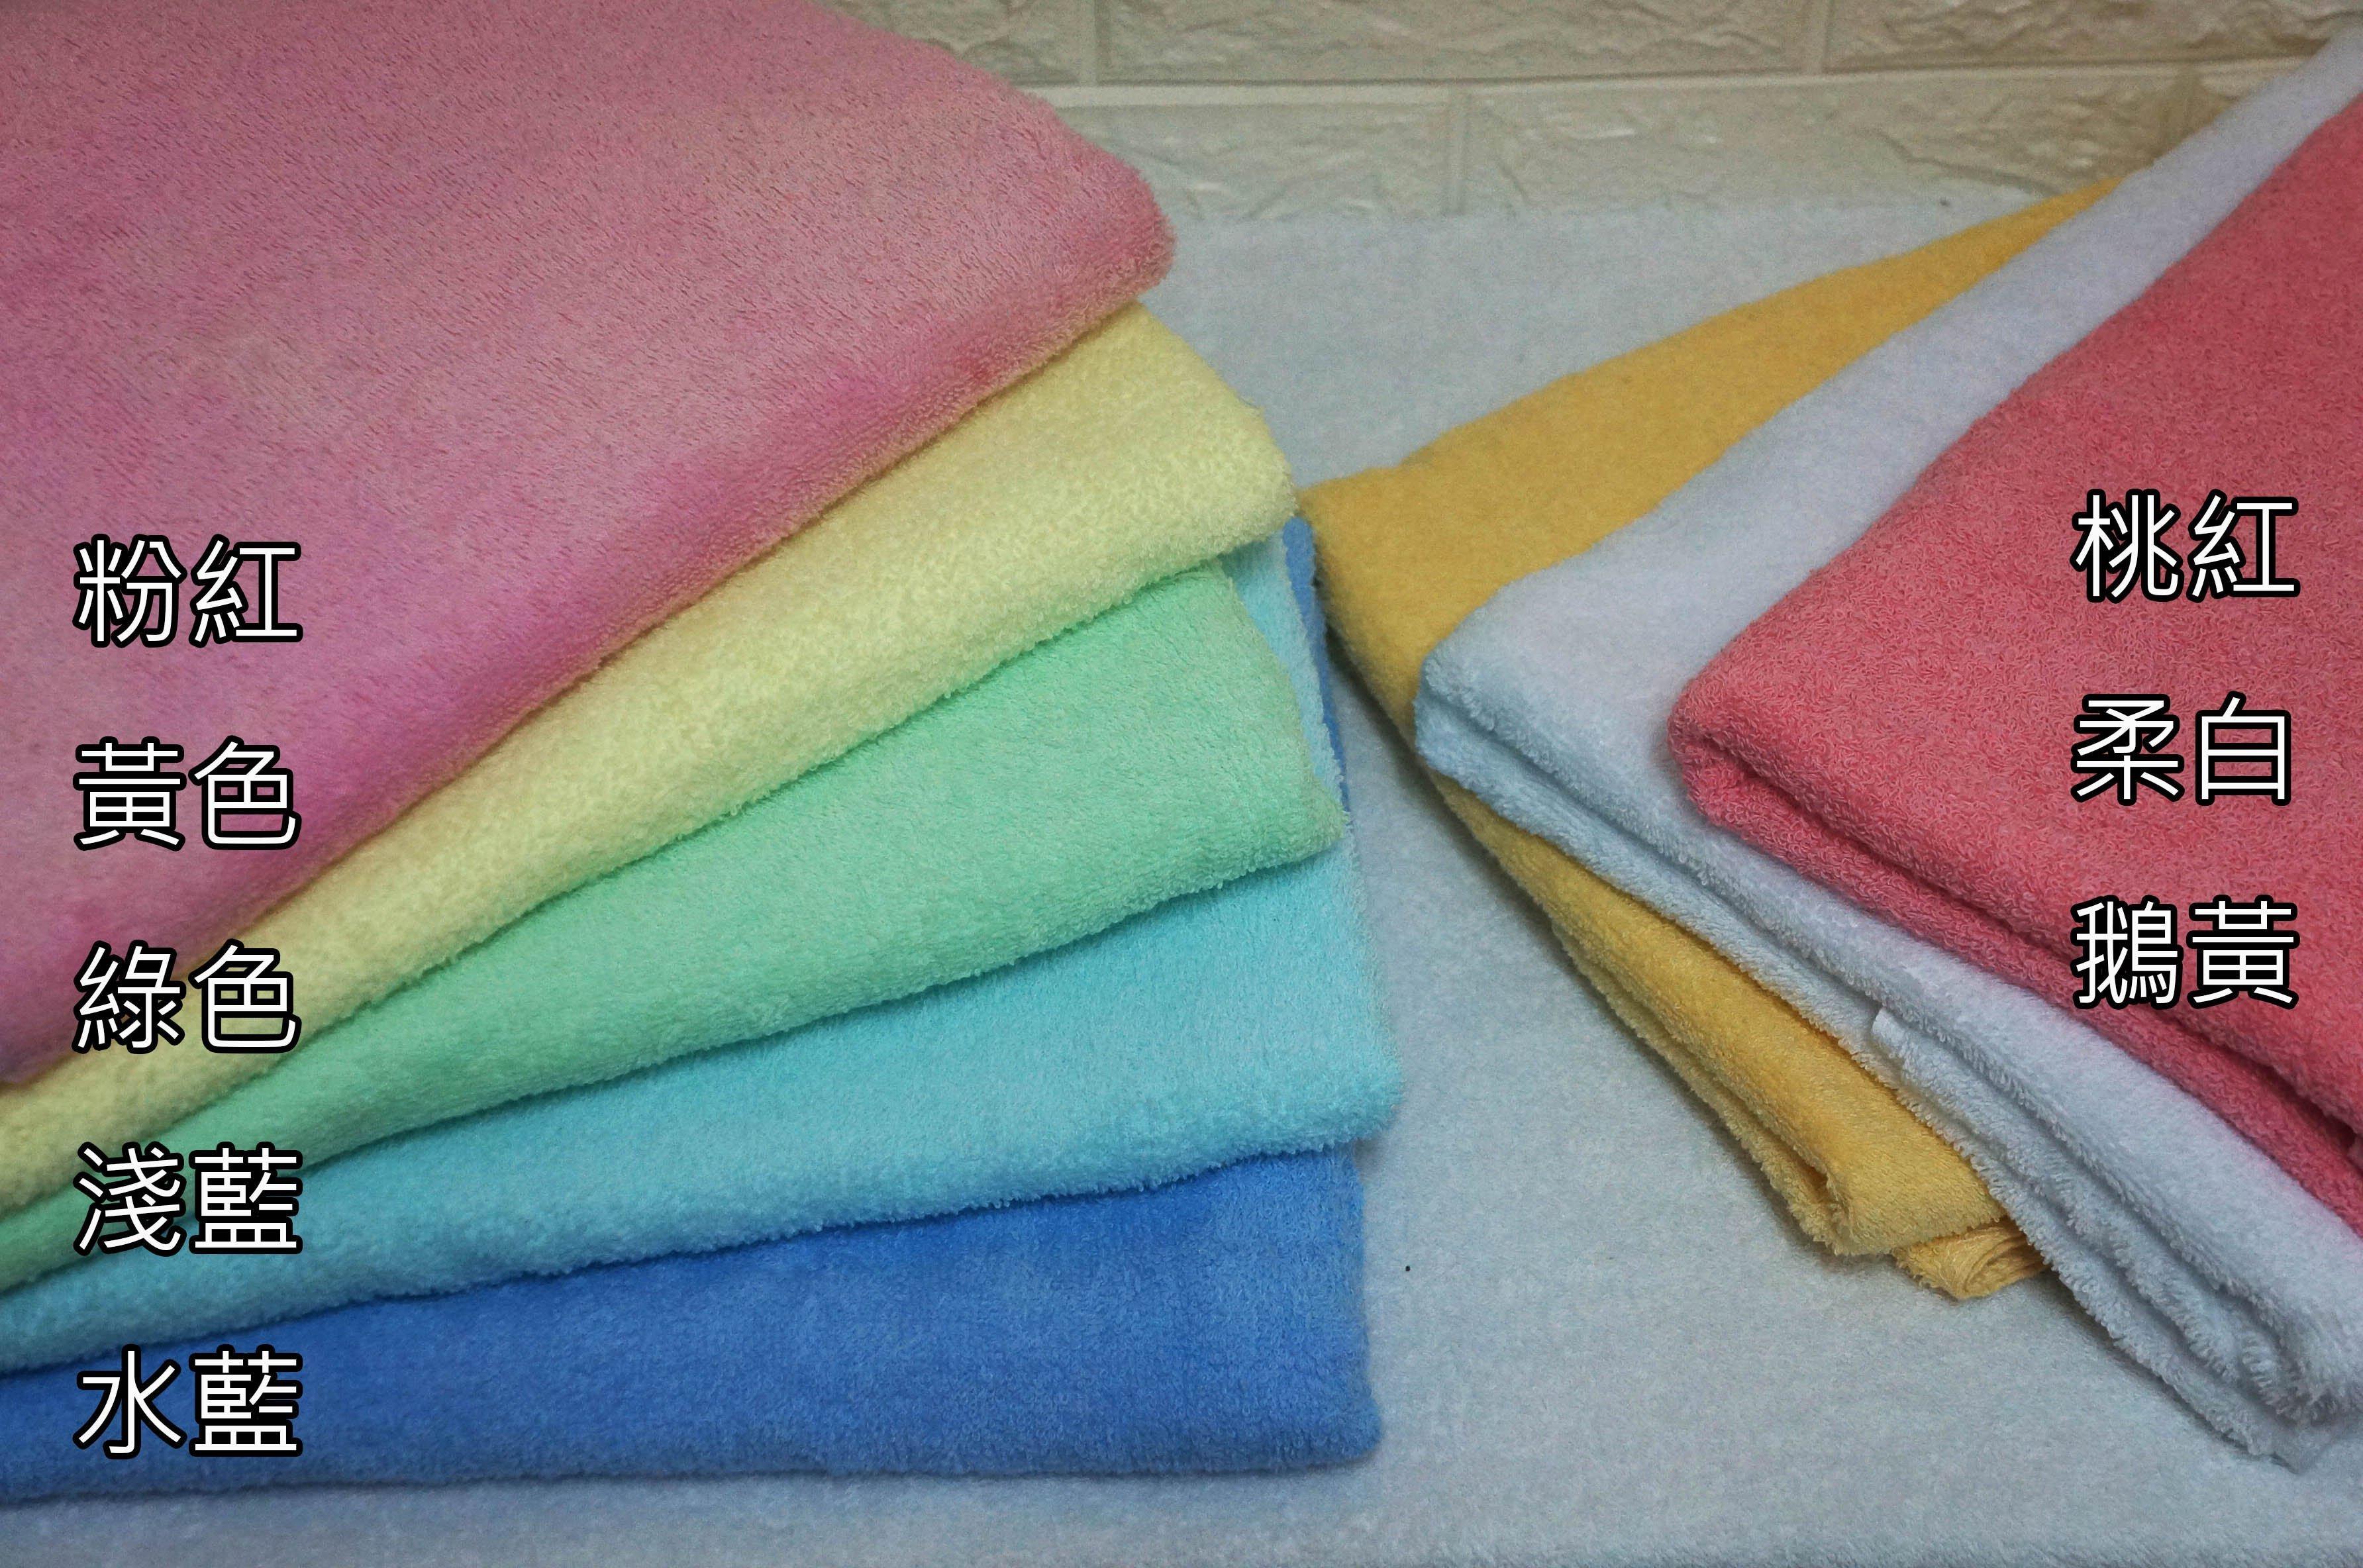 ((MIT毛巾))8-10兩ng款浴巾-些許瑕疵但不影響 ,輕薄 !!